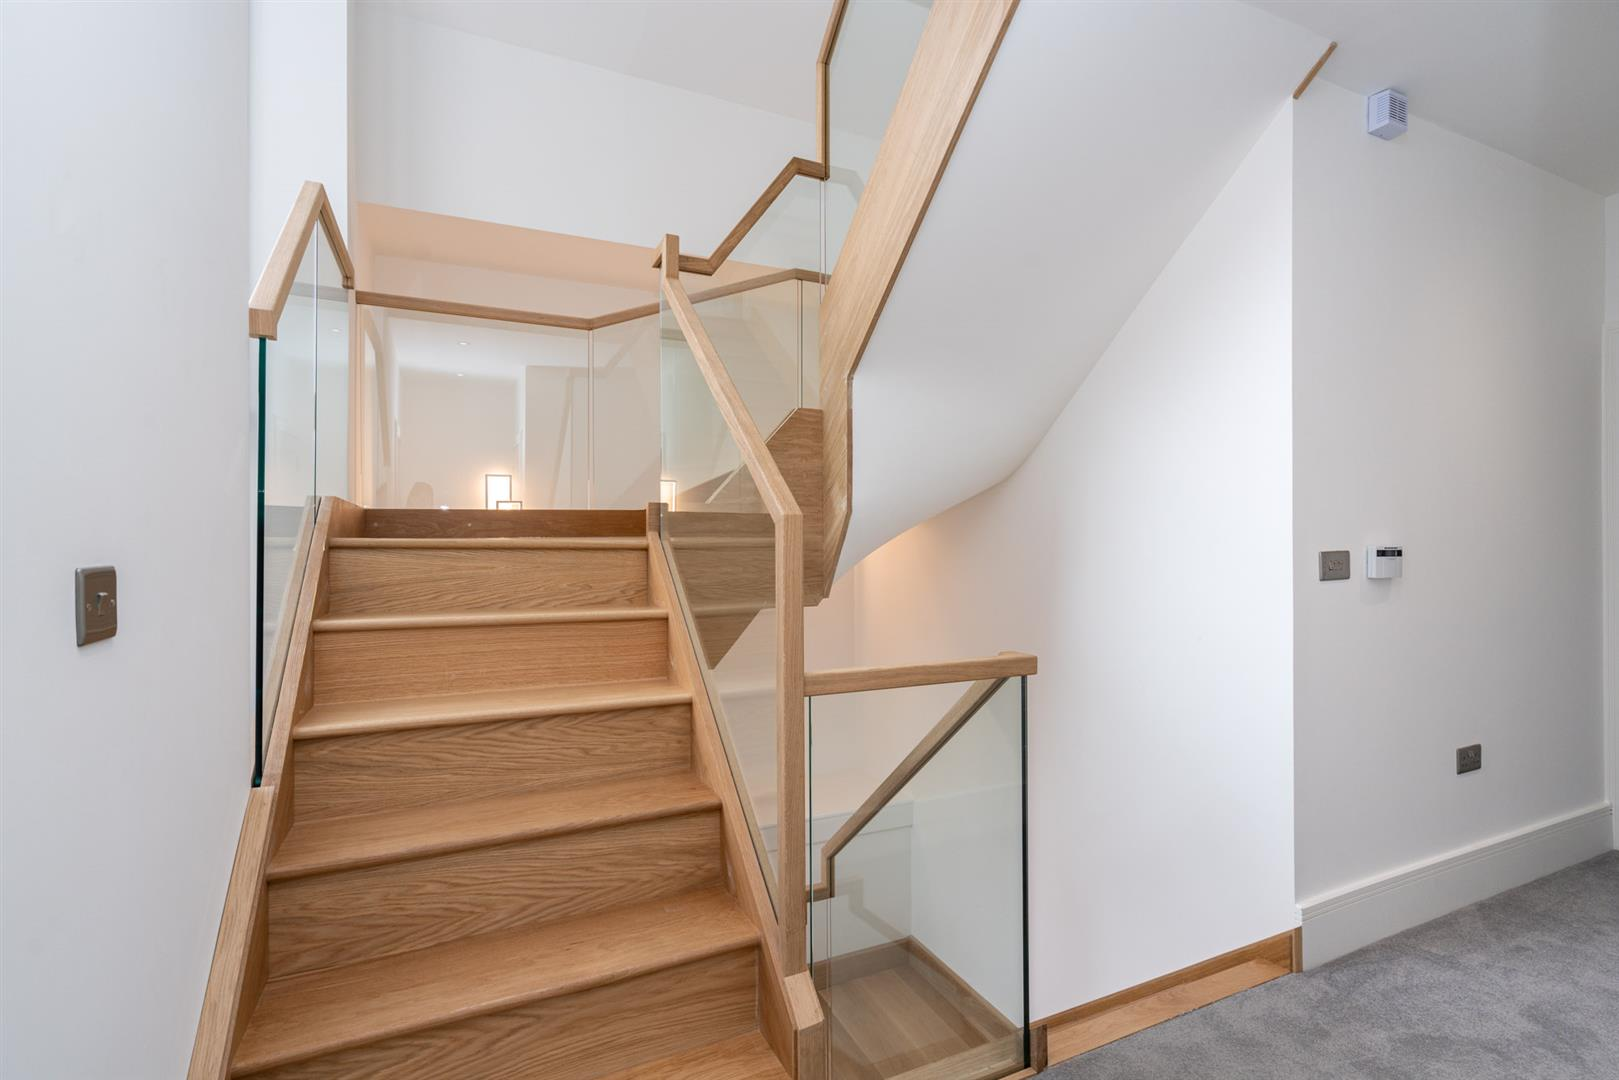 Hillcrest-3181 - stair case 2nd floor.jpg